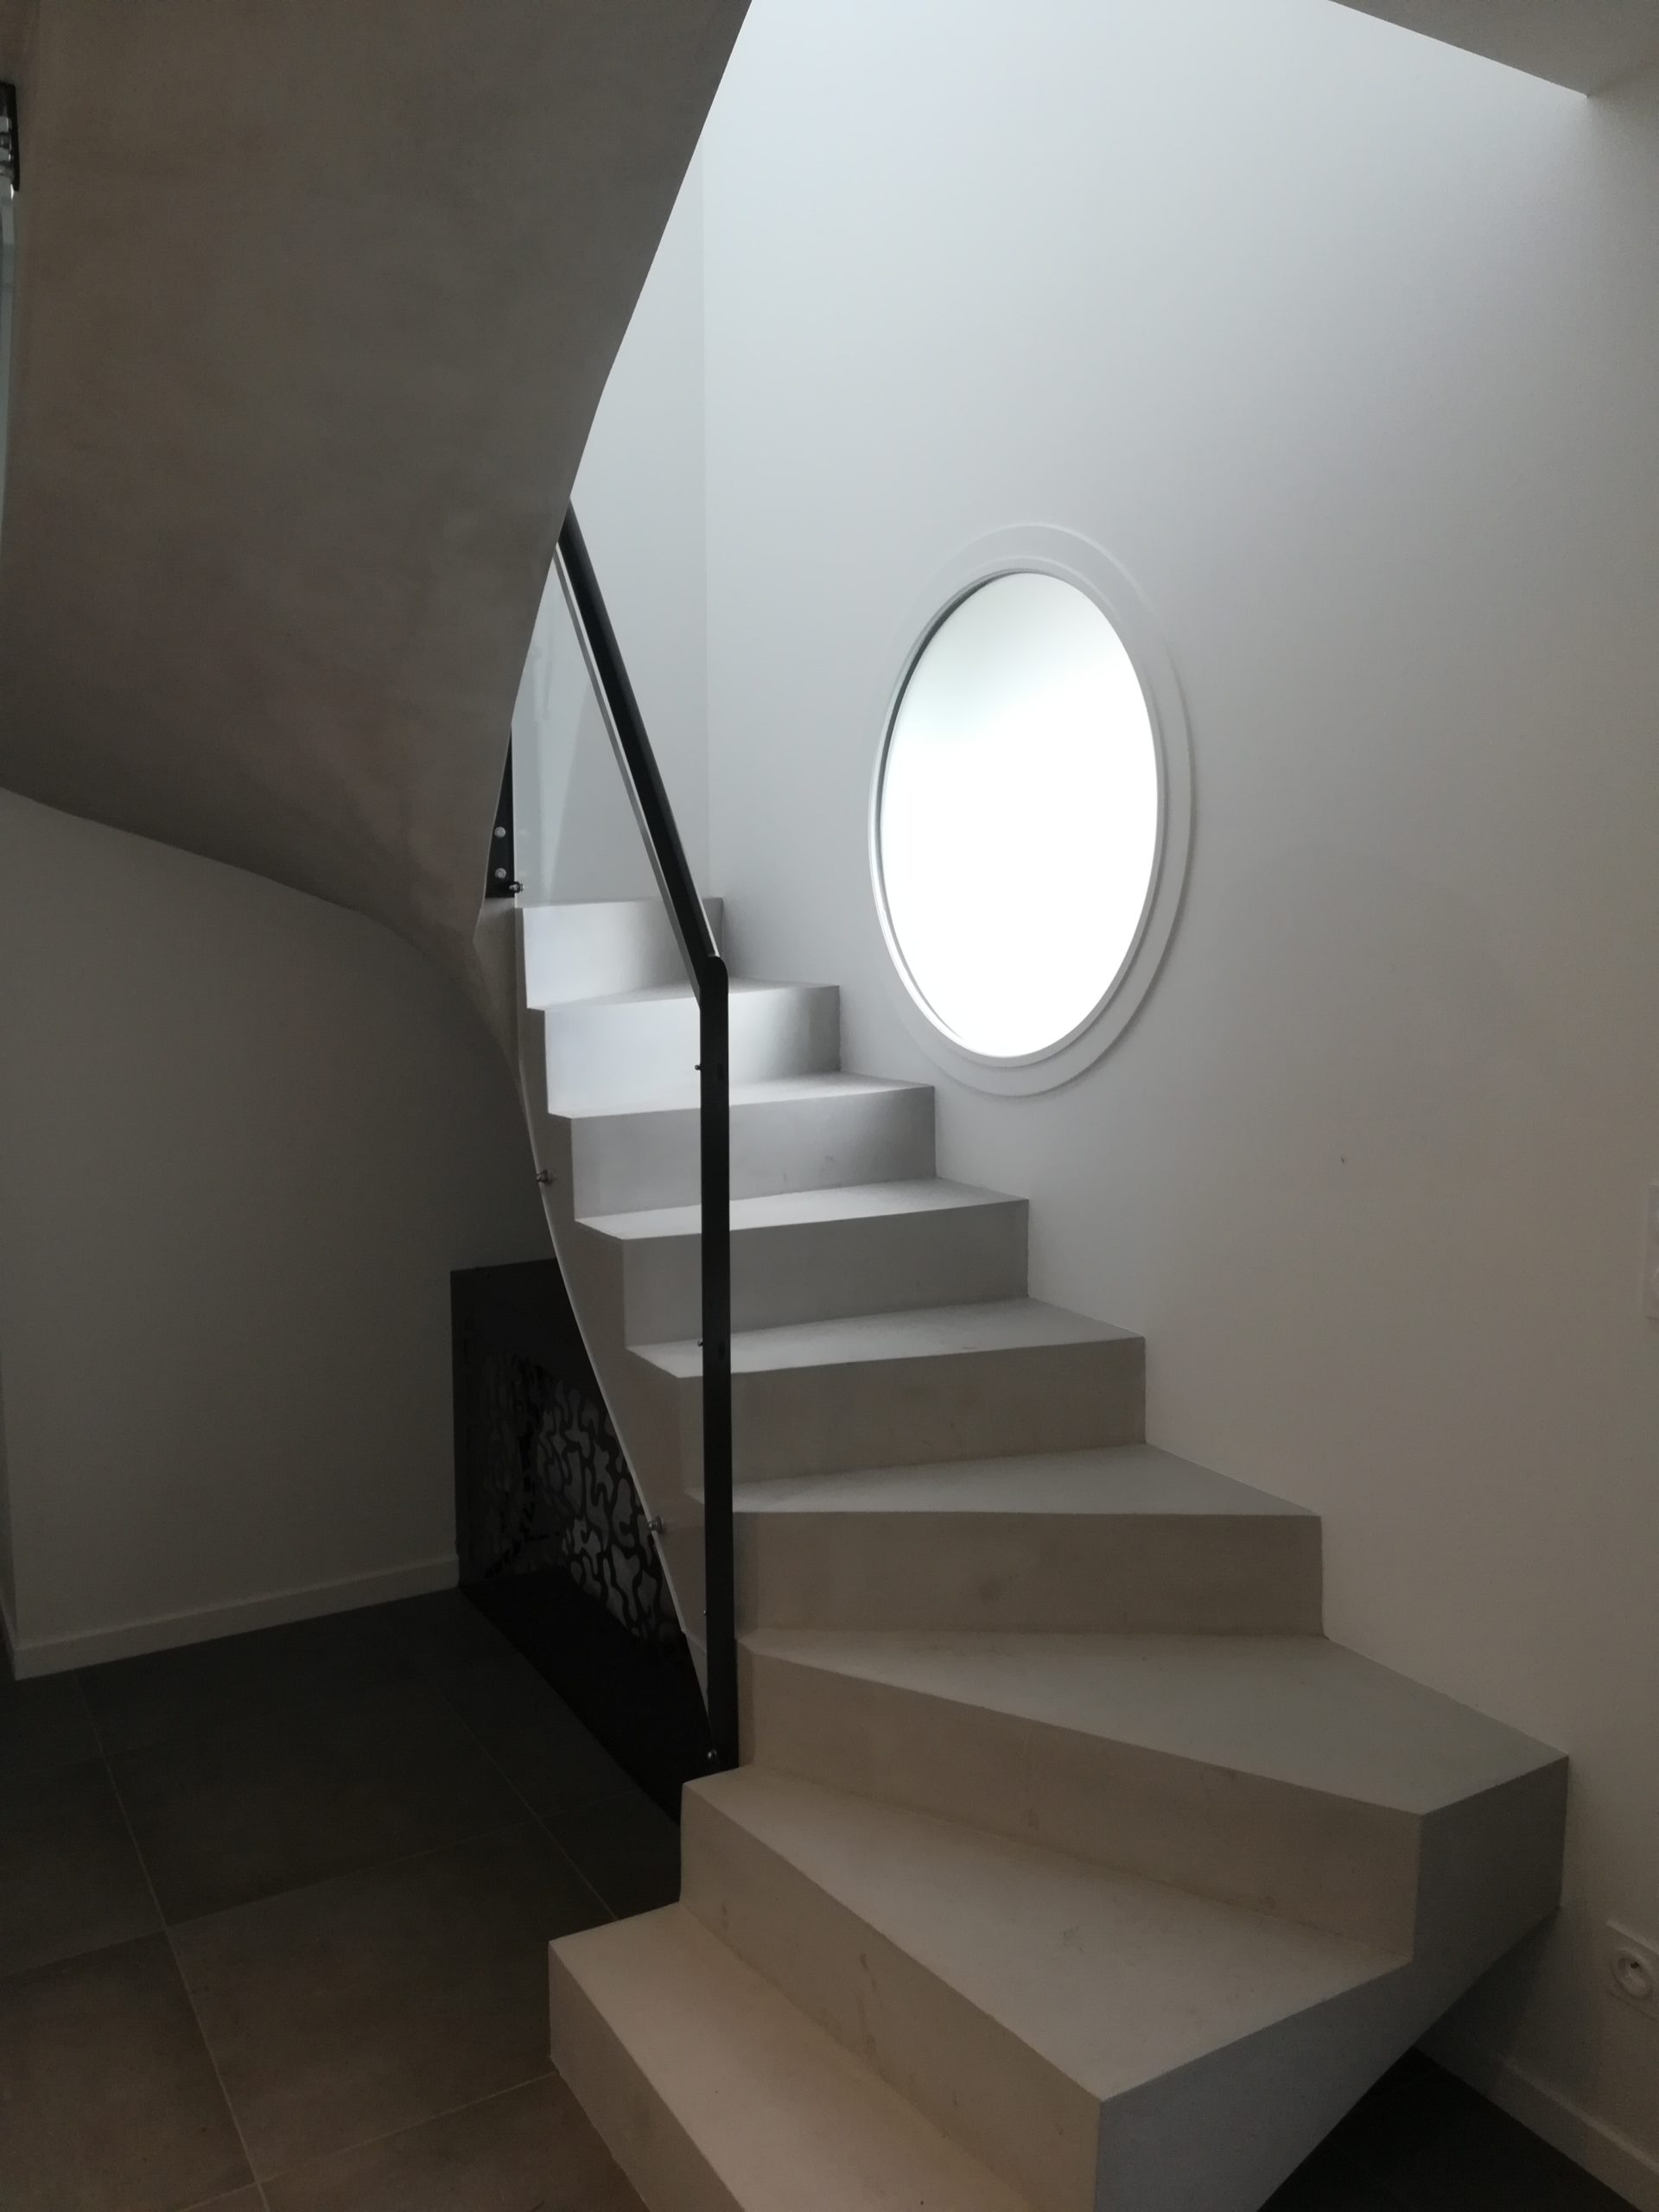 Escalier Design Plexiglass / Métal